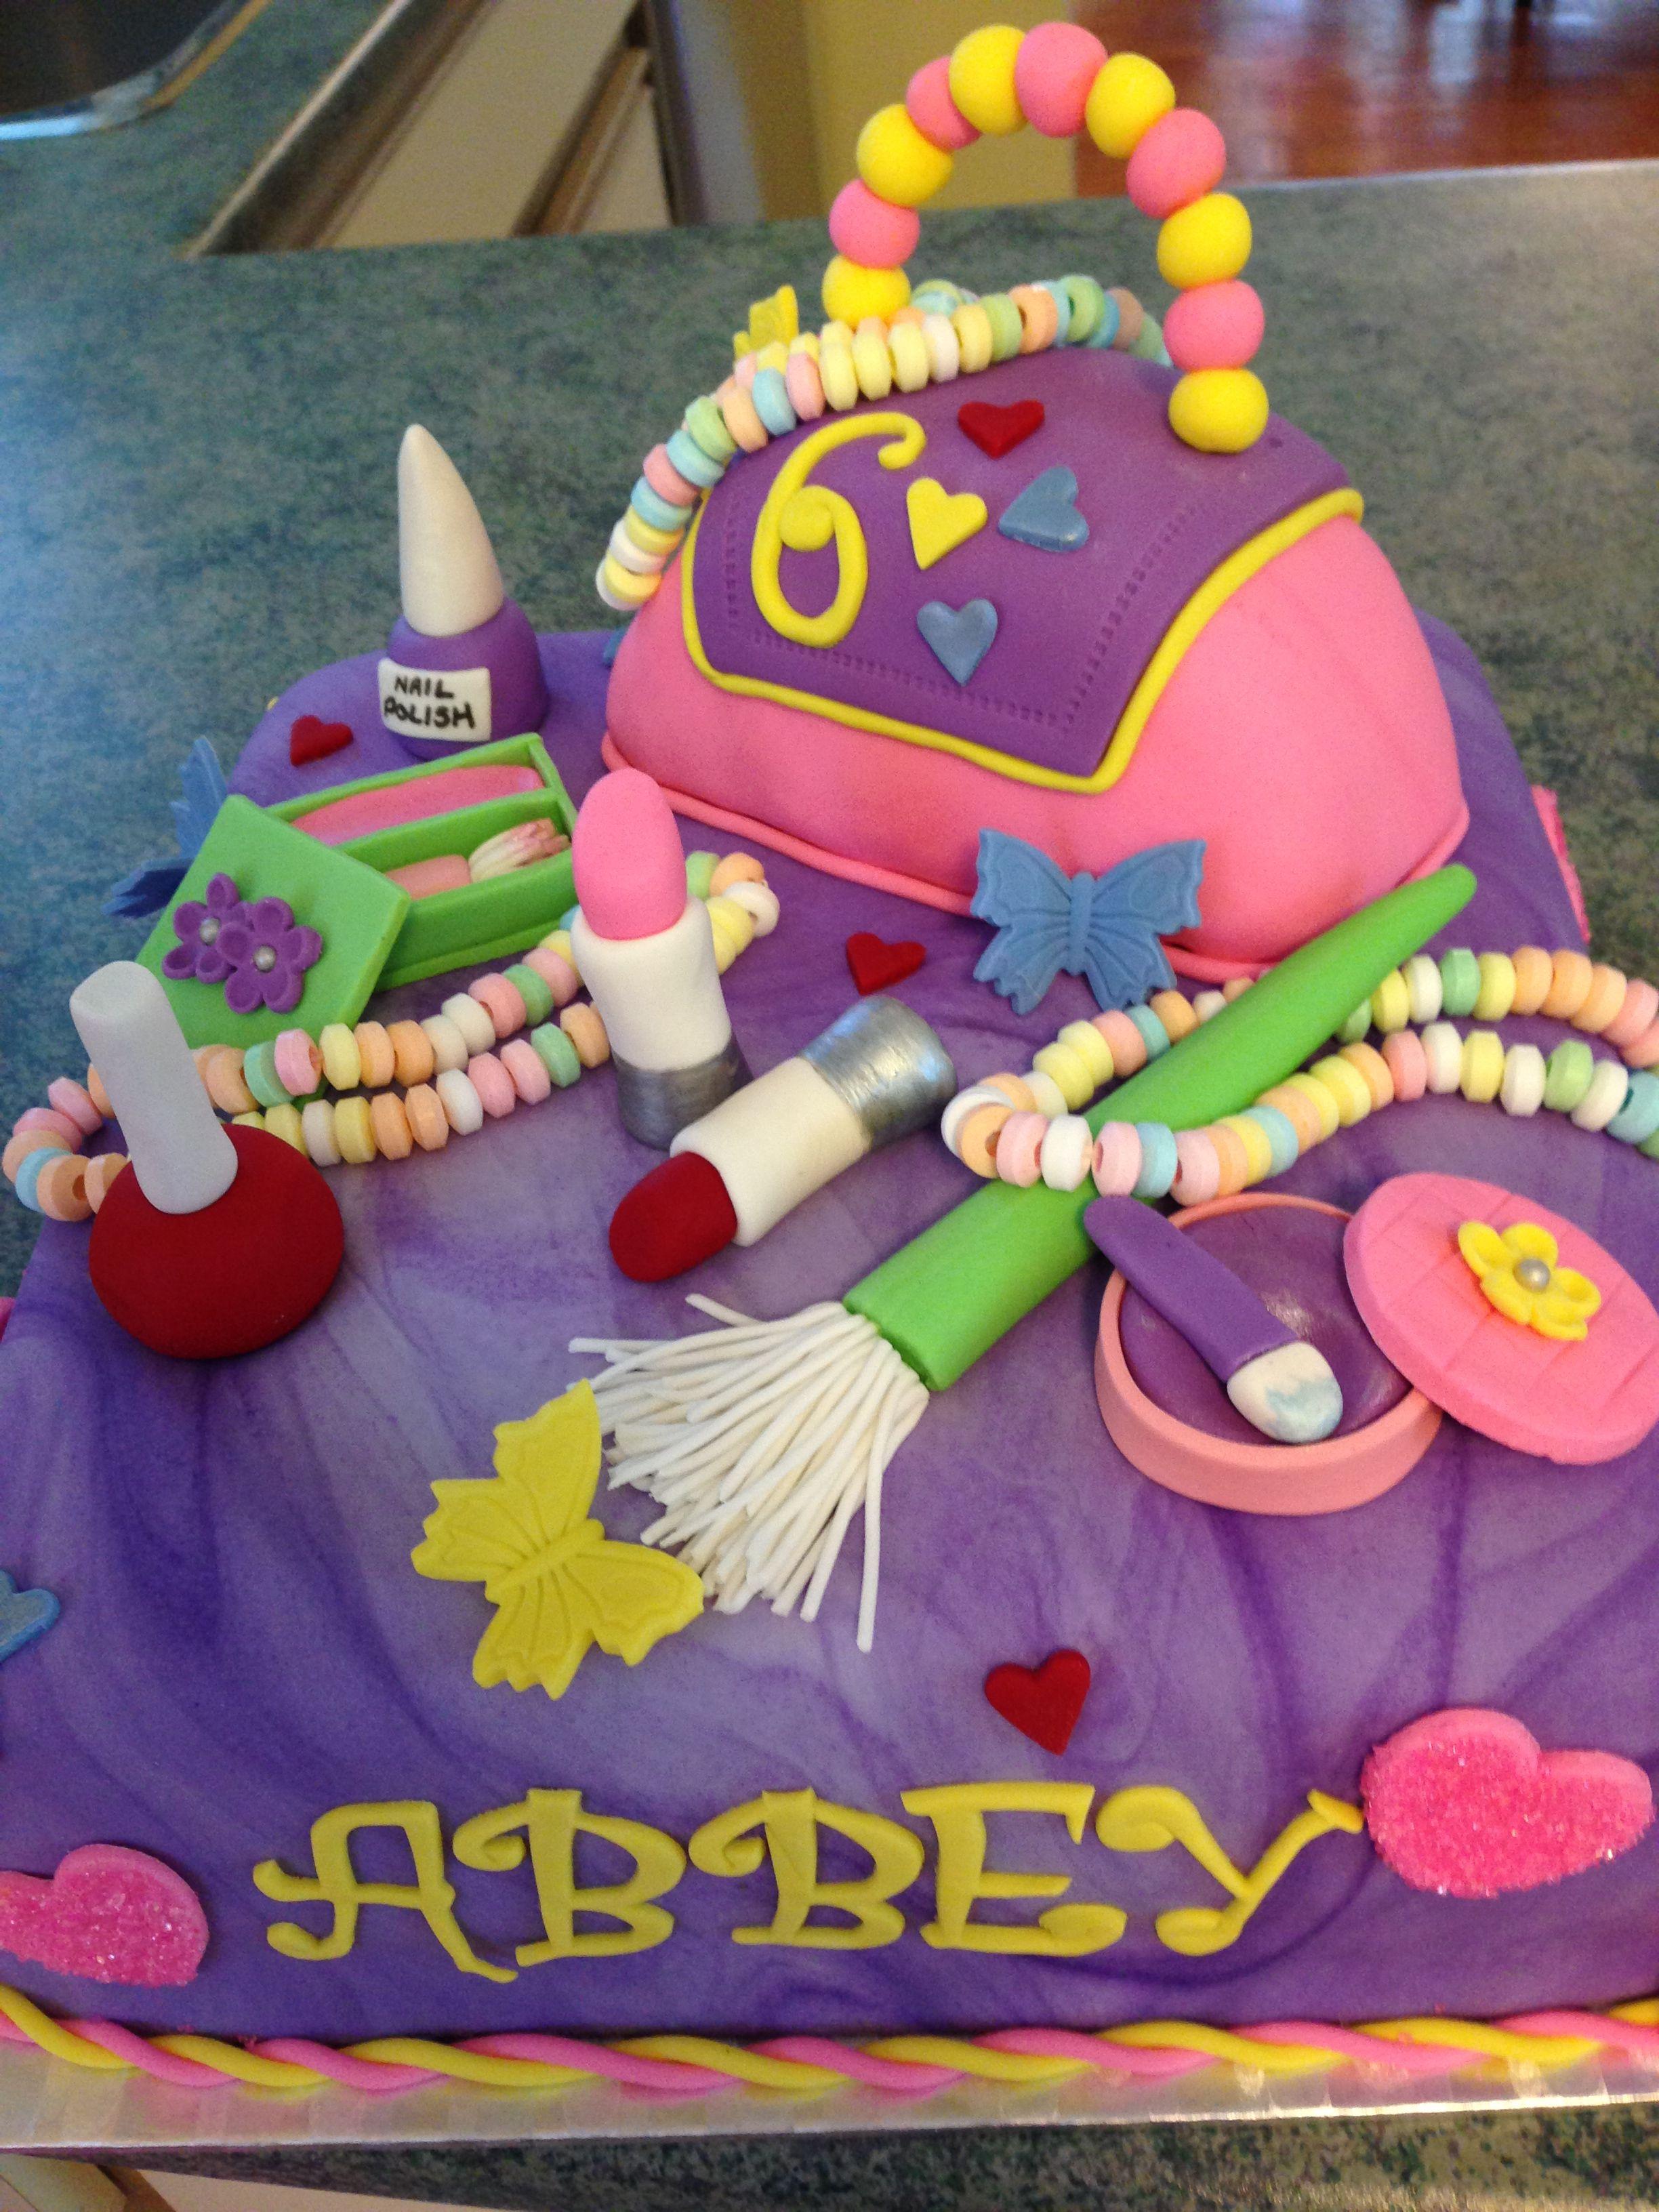 Childrens Birthday Cakes Amazing Cakes Pinterest Birthday